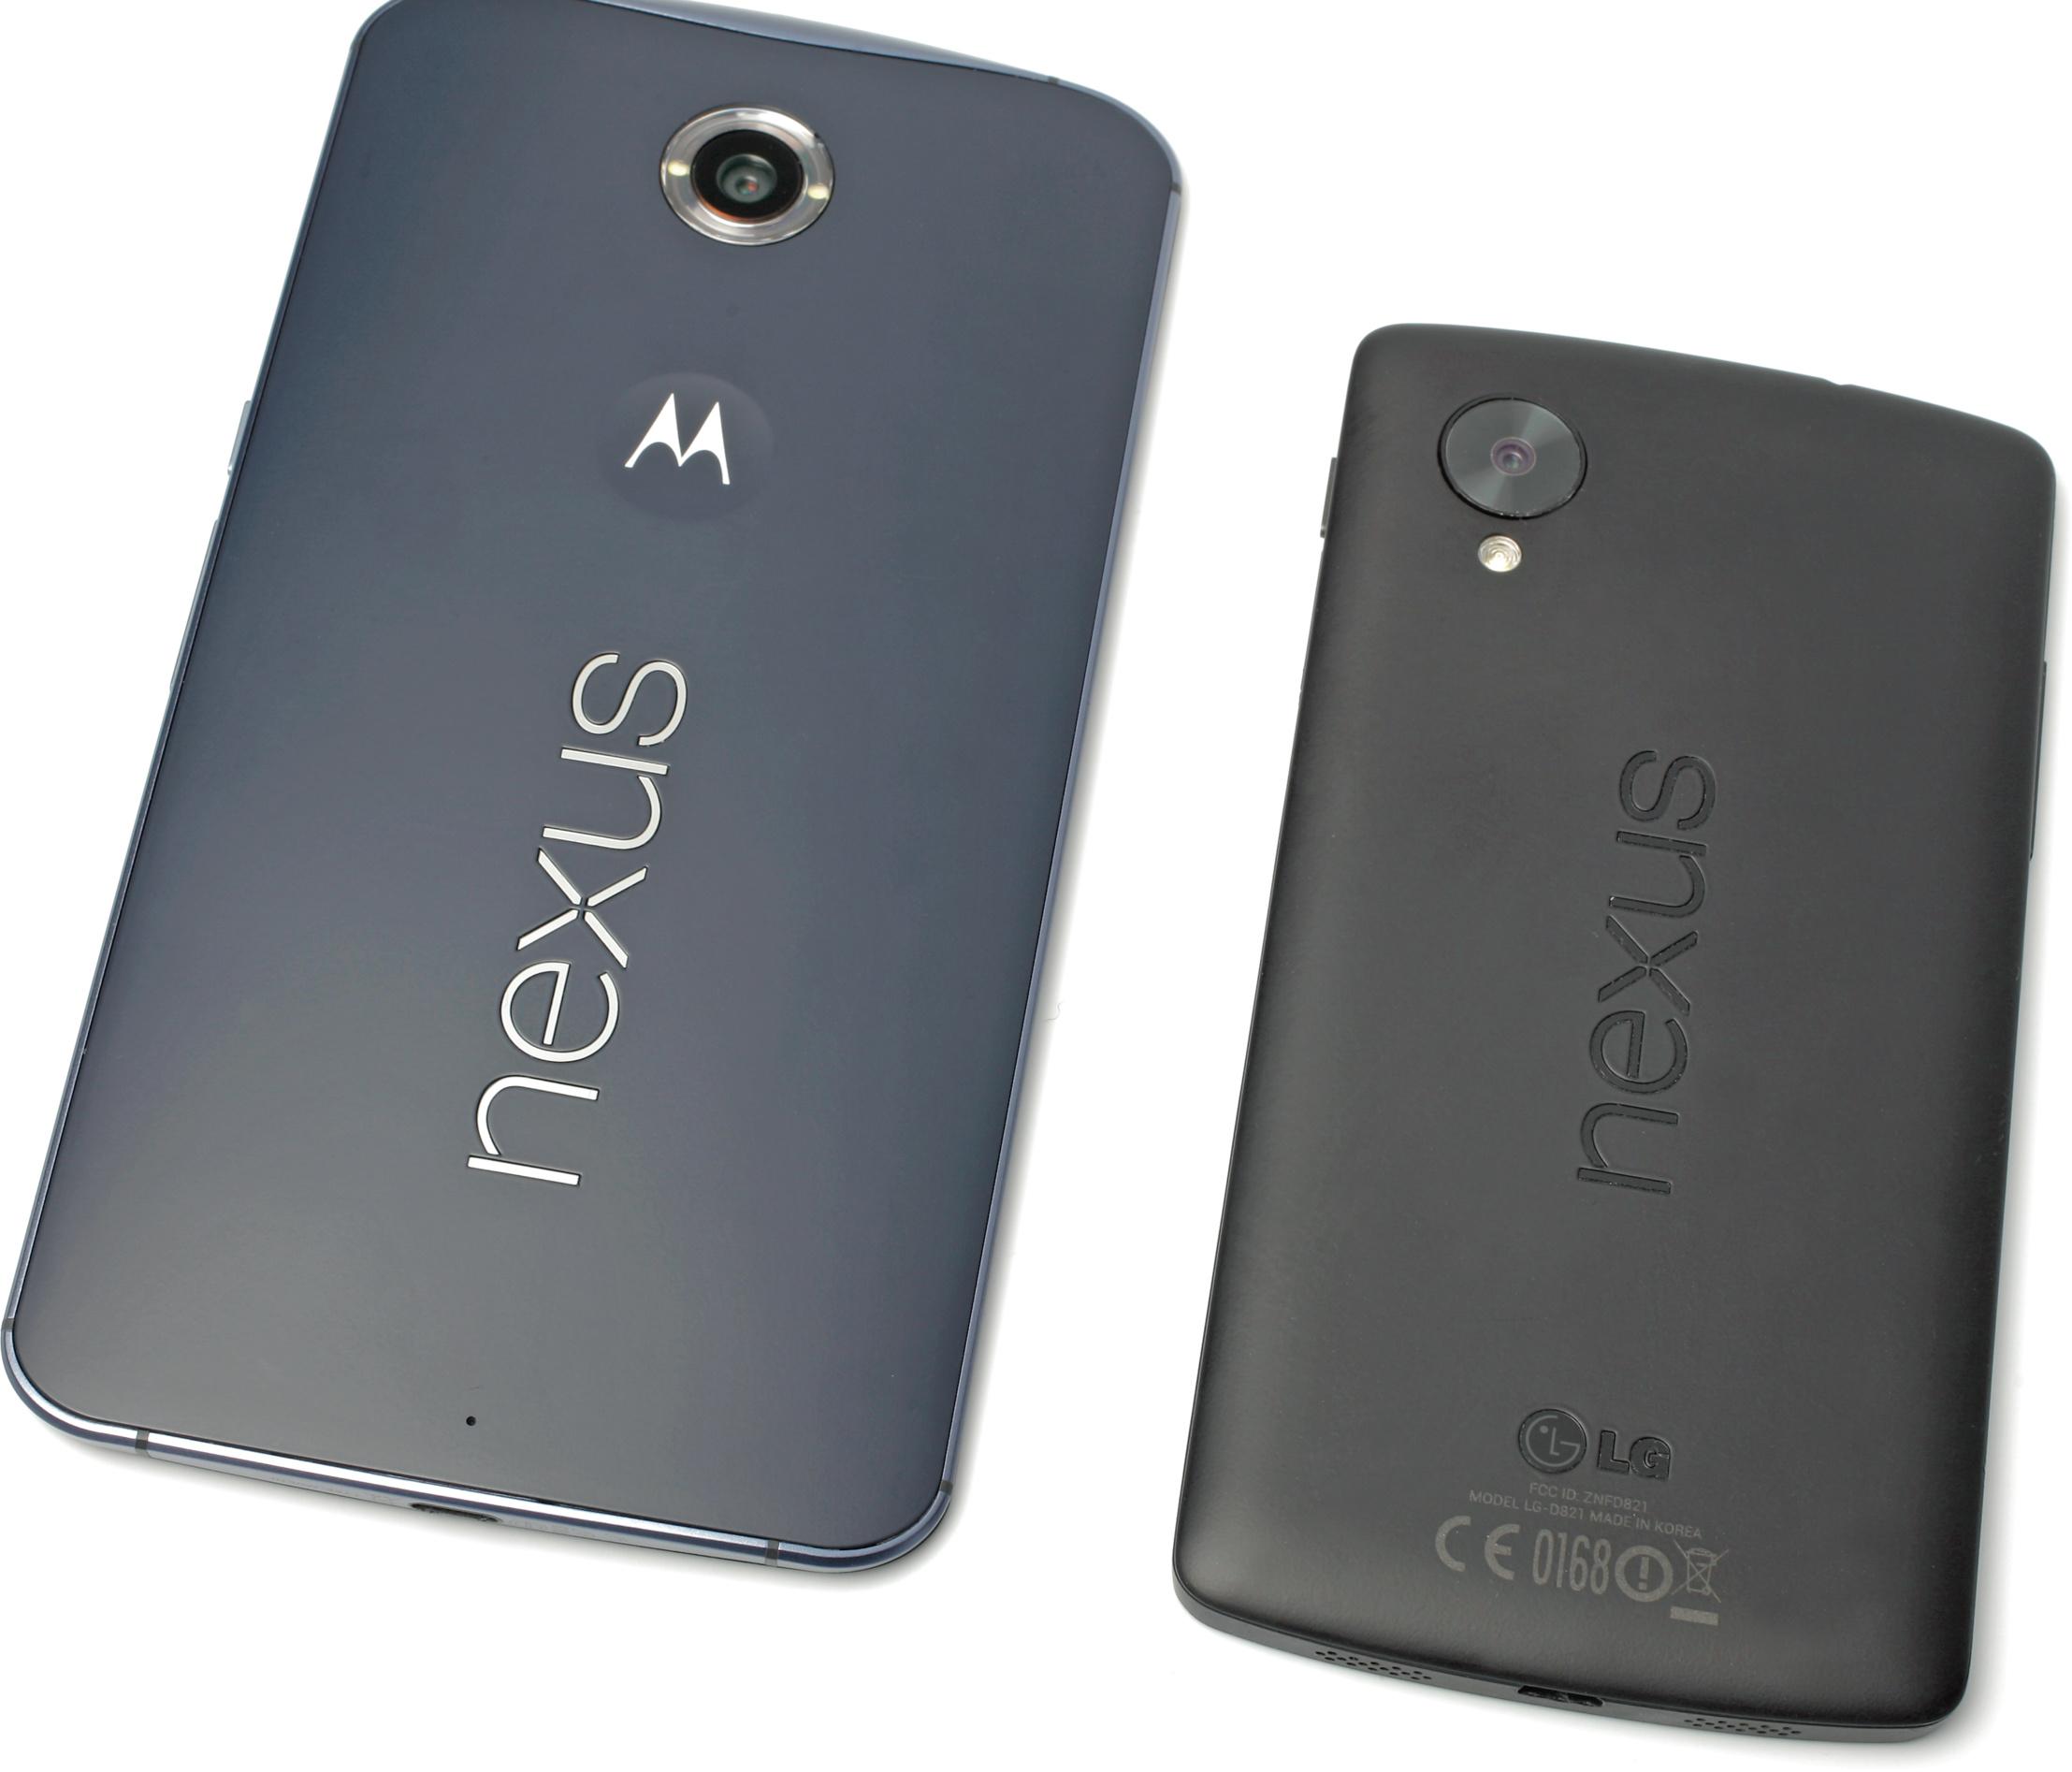 6 Zoll Smartphone Nexus 6 Mit Sauberem Android 5 Ct Magazin